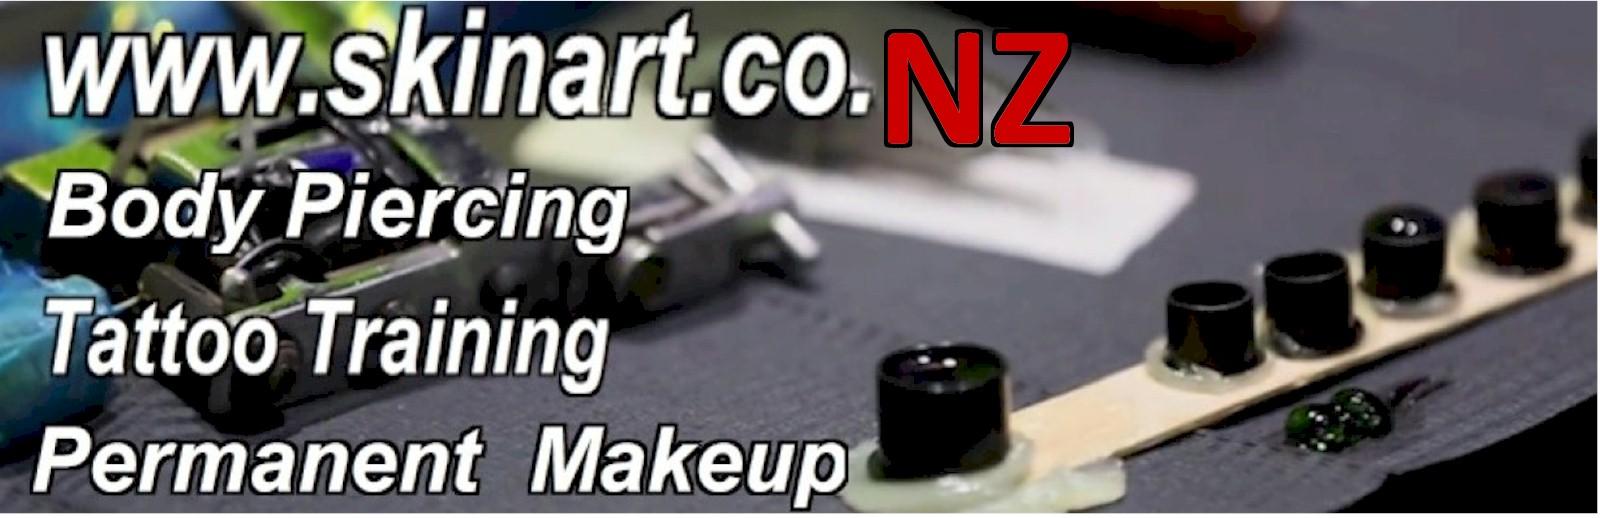 Tattoo and Piercing Training New Zealand